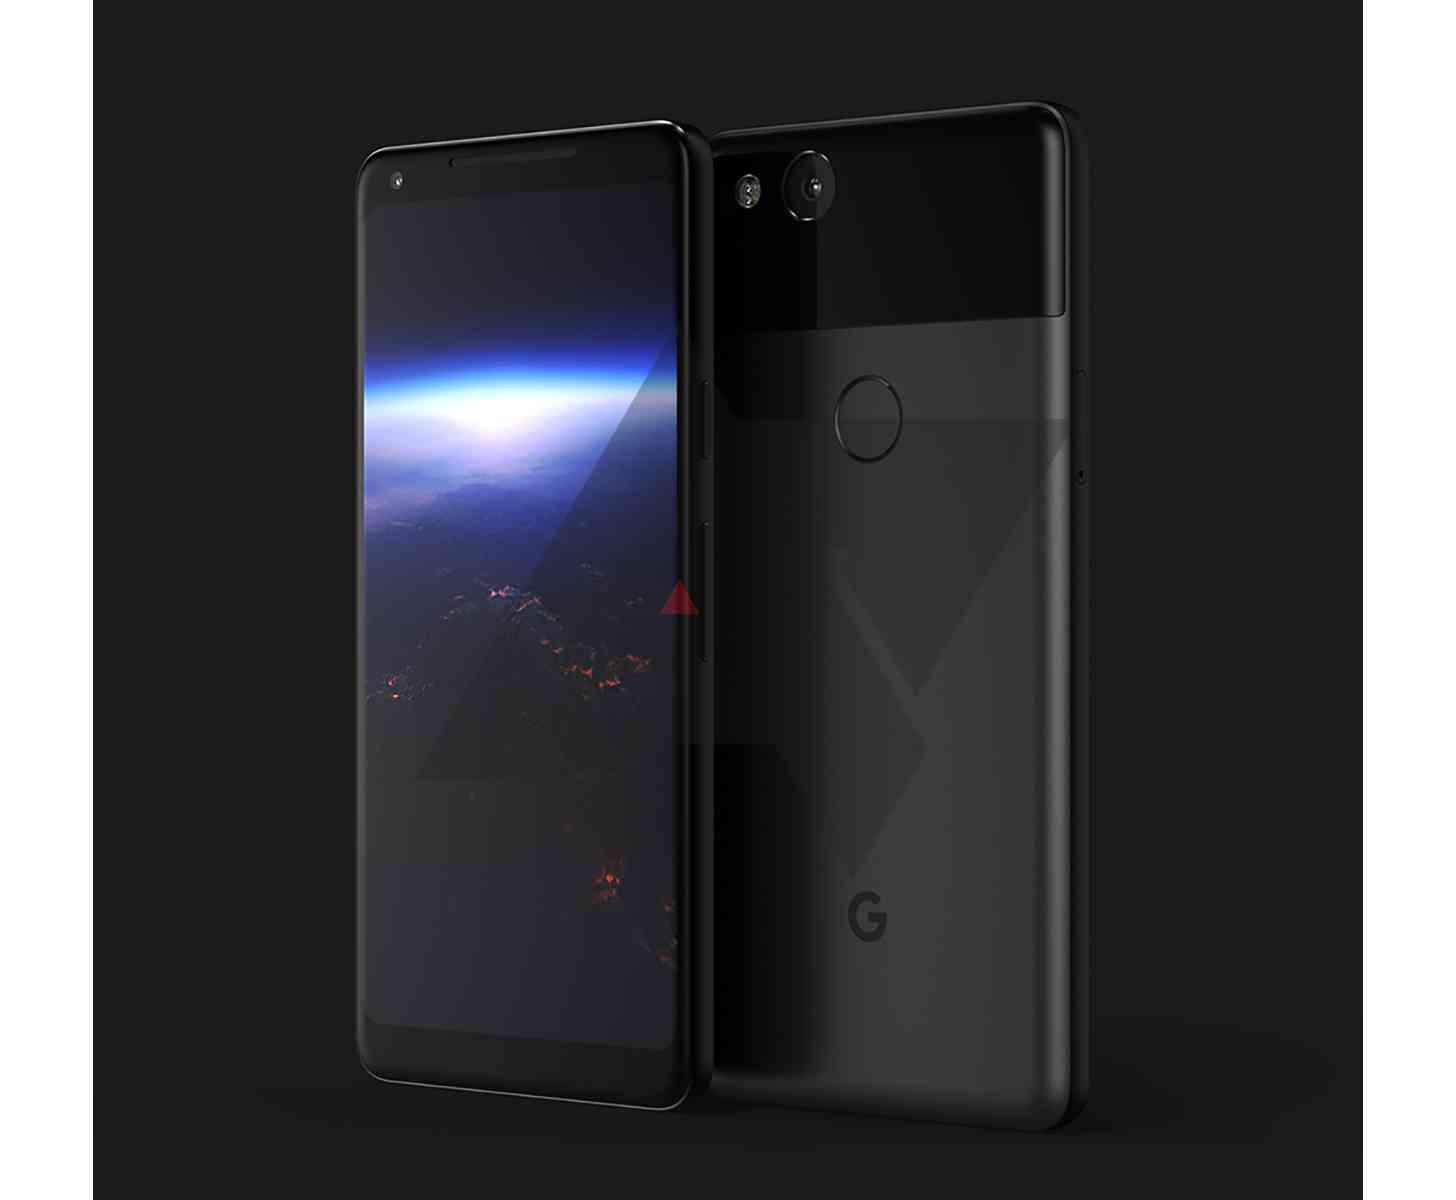 Google Pixel XL 2017 image leak